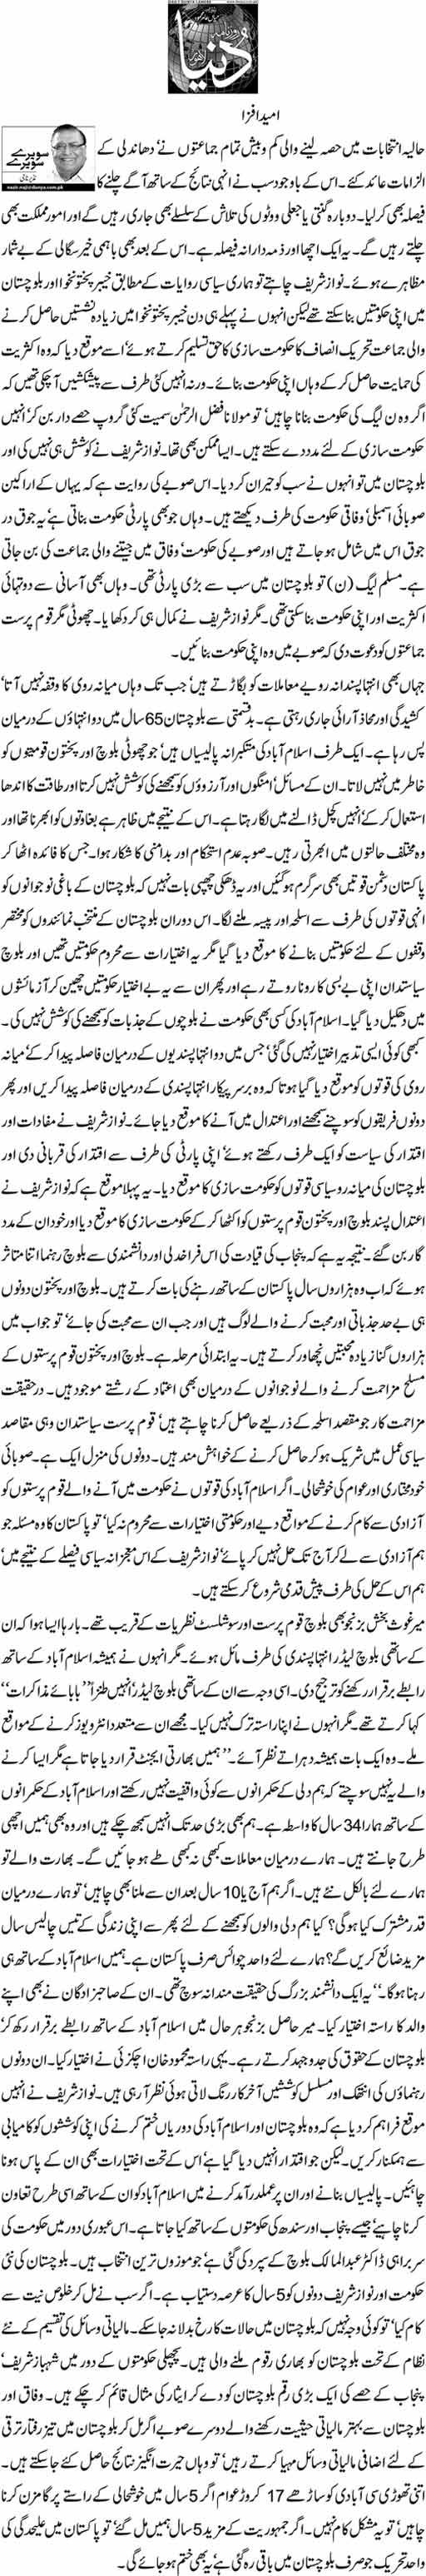 Umeed Afza - Nazeer Naji